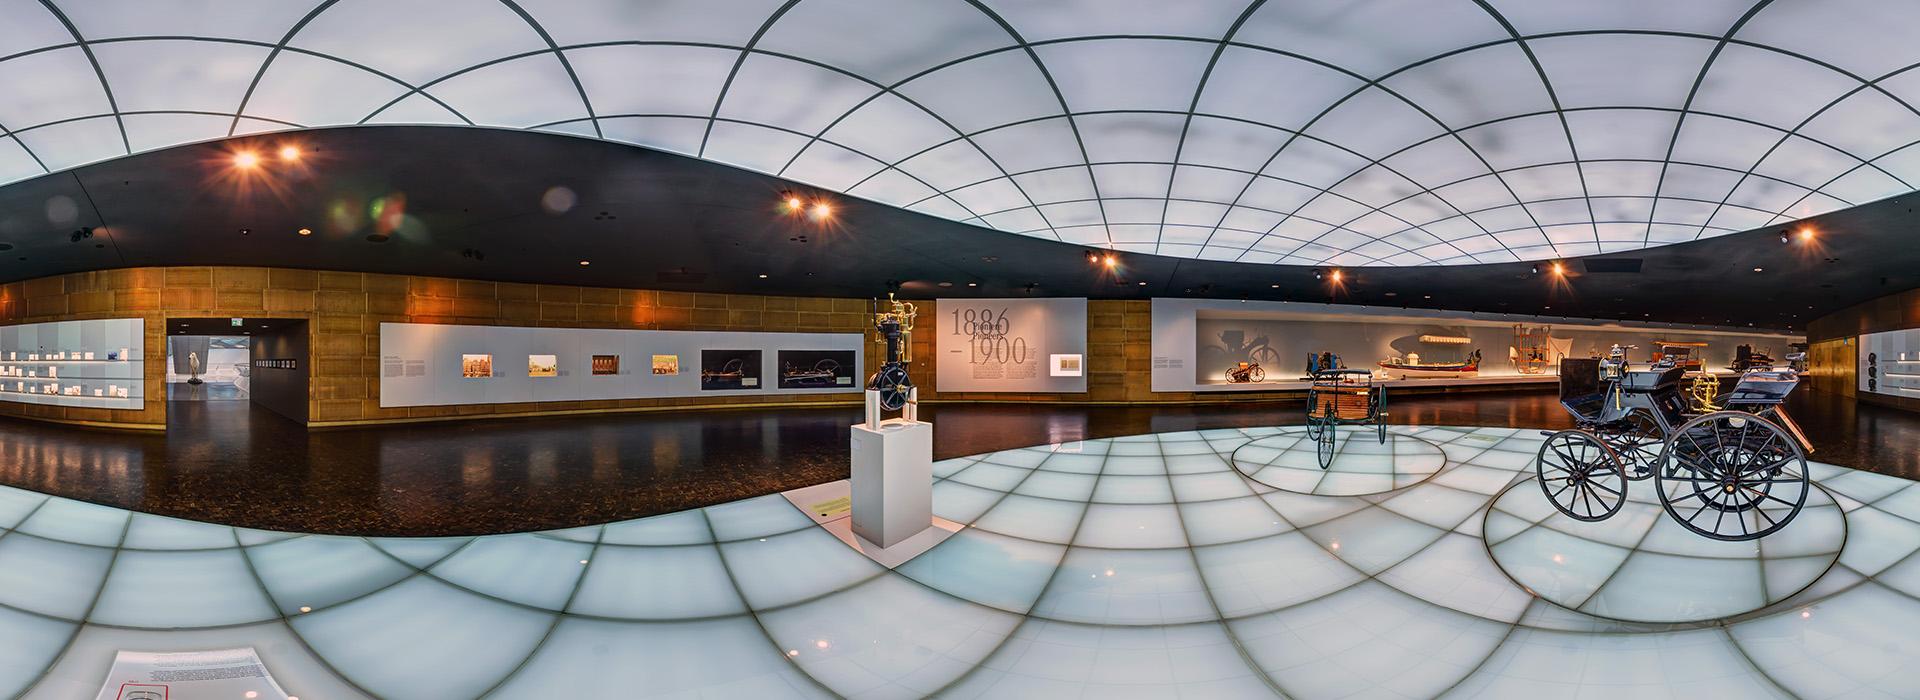 01_mb_museum_slide